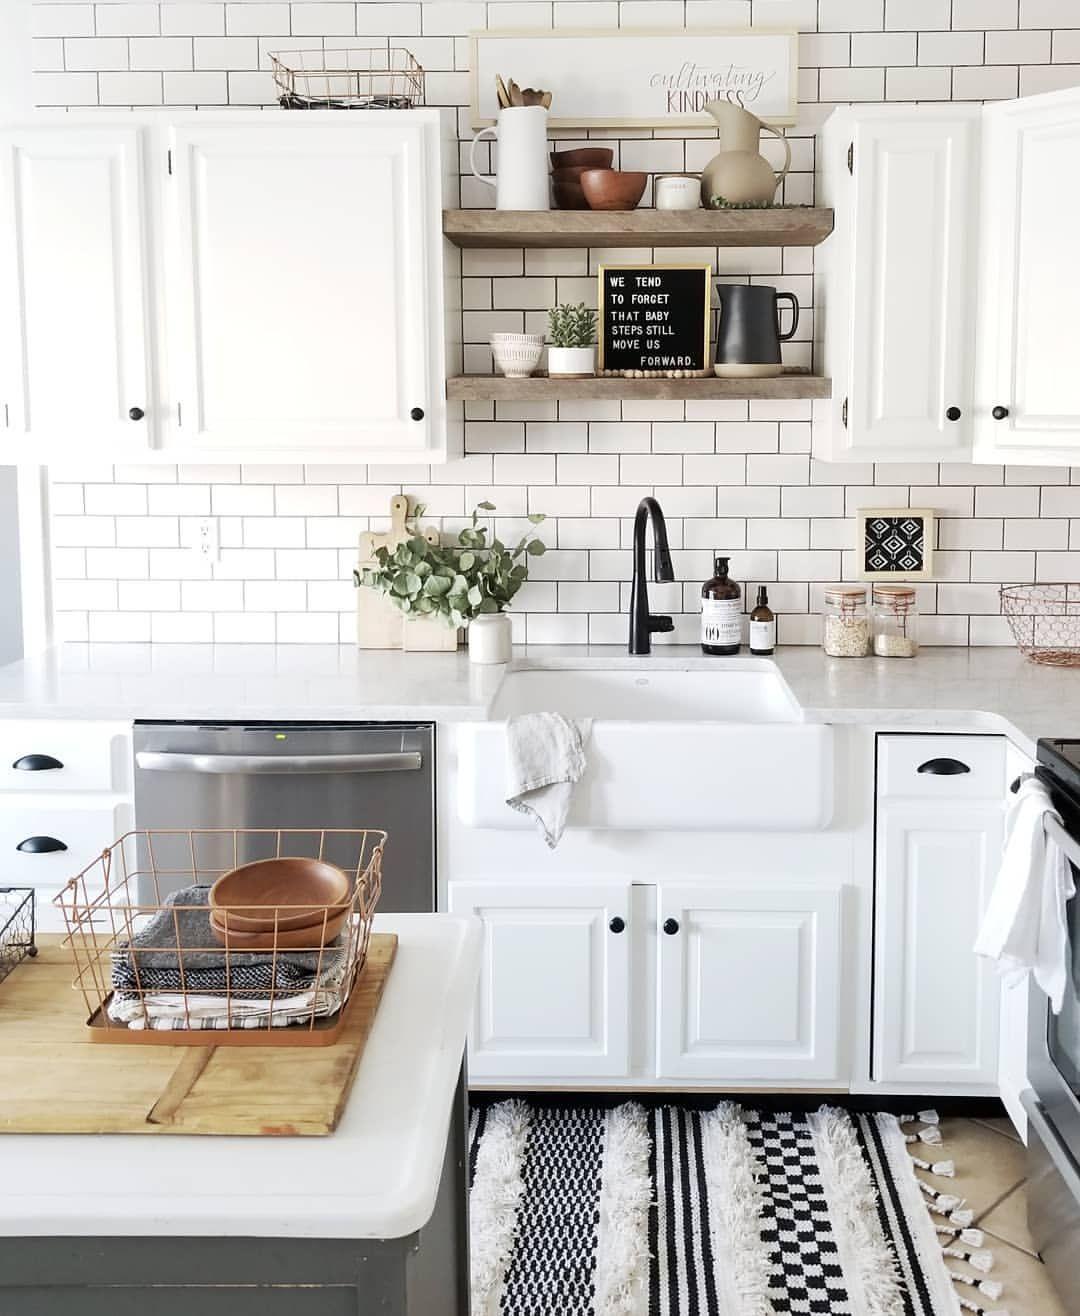 1 173 Curtidas 120 Comentarios Cynthia Harper Cynthia Harper No Instagram Removing The U Kitchen Design Kitchen Tiles Design White Subway Tile Kitchen